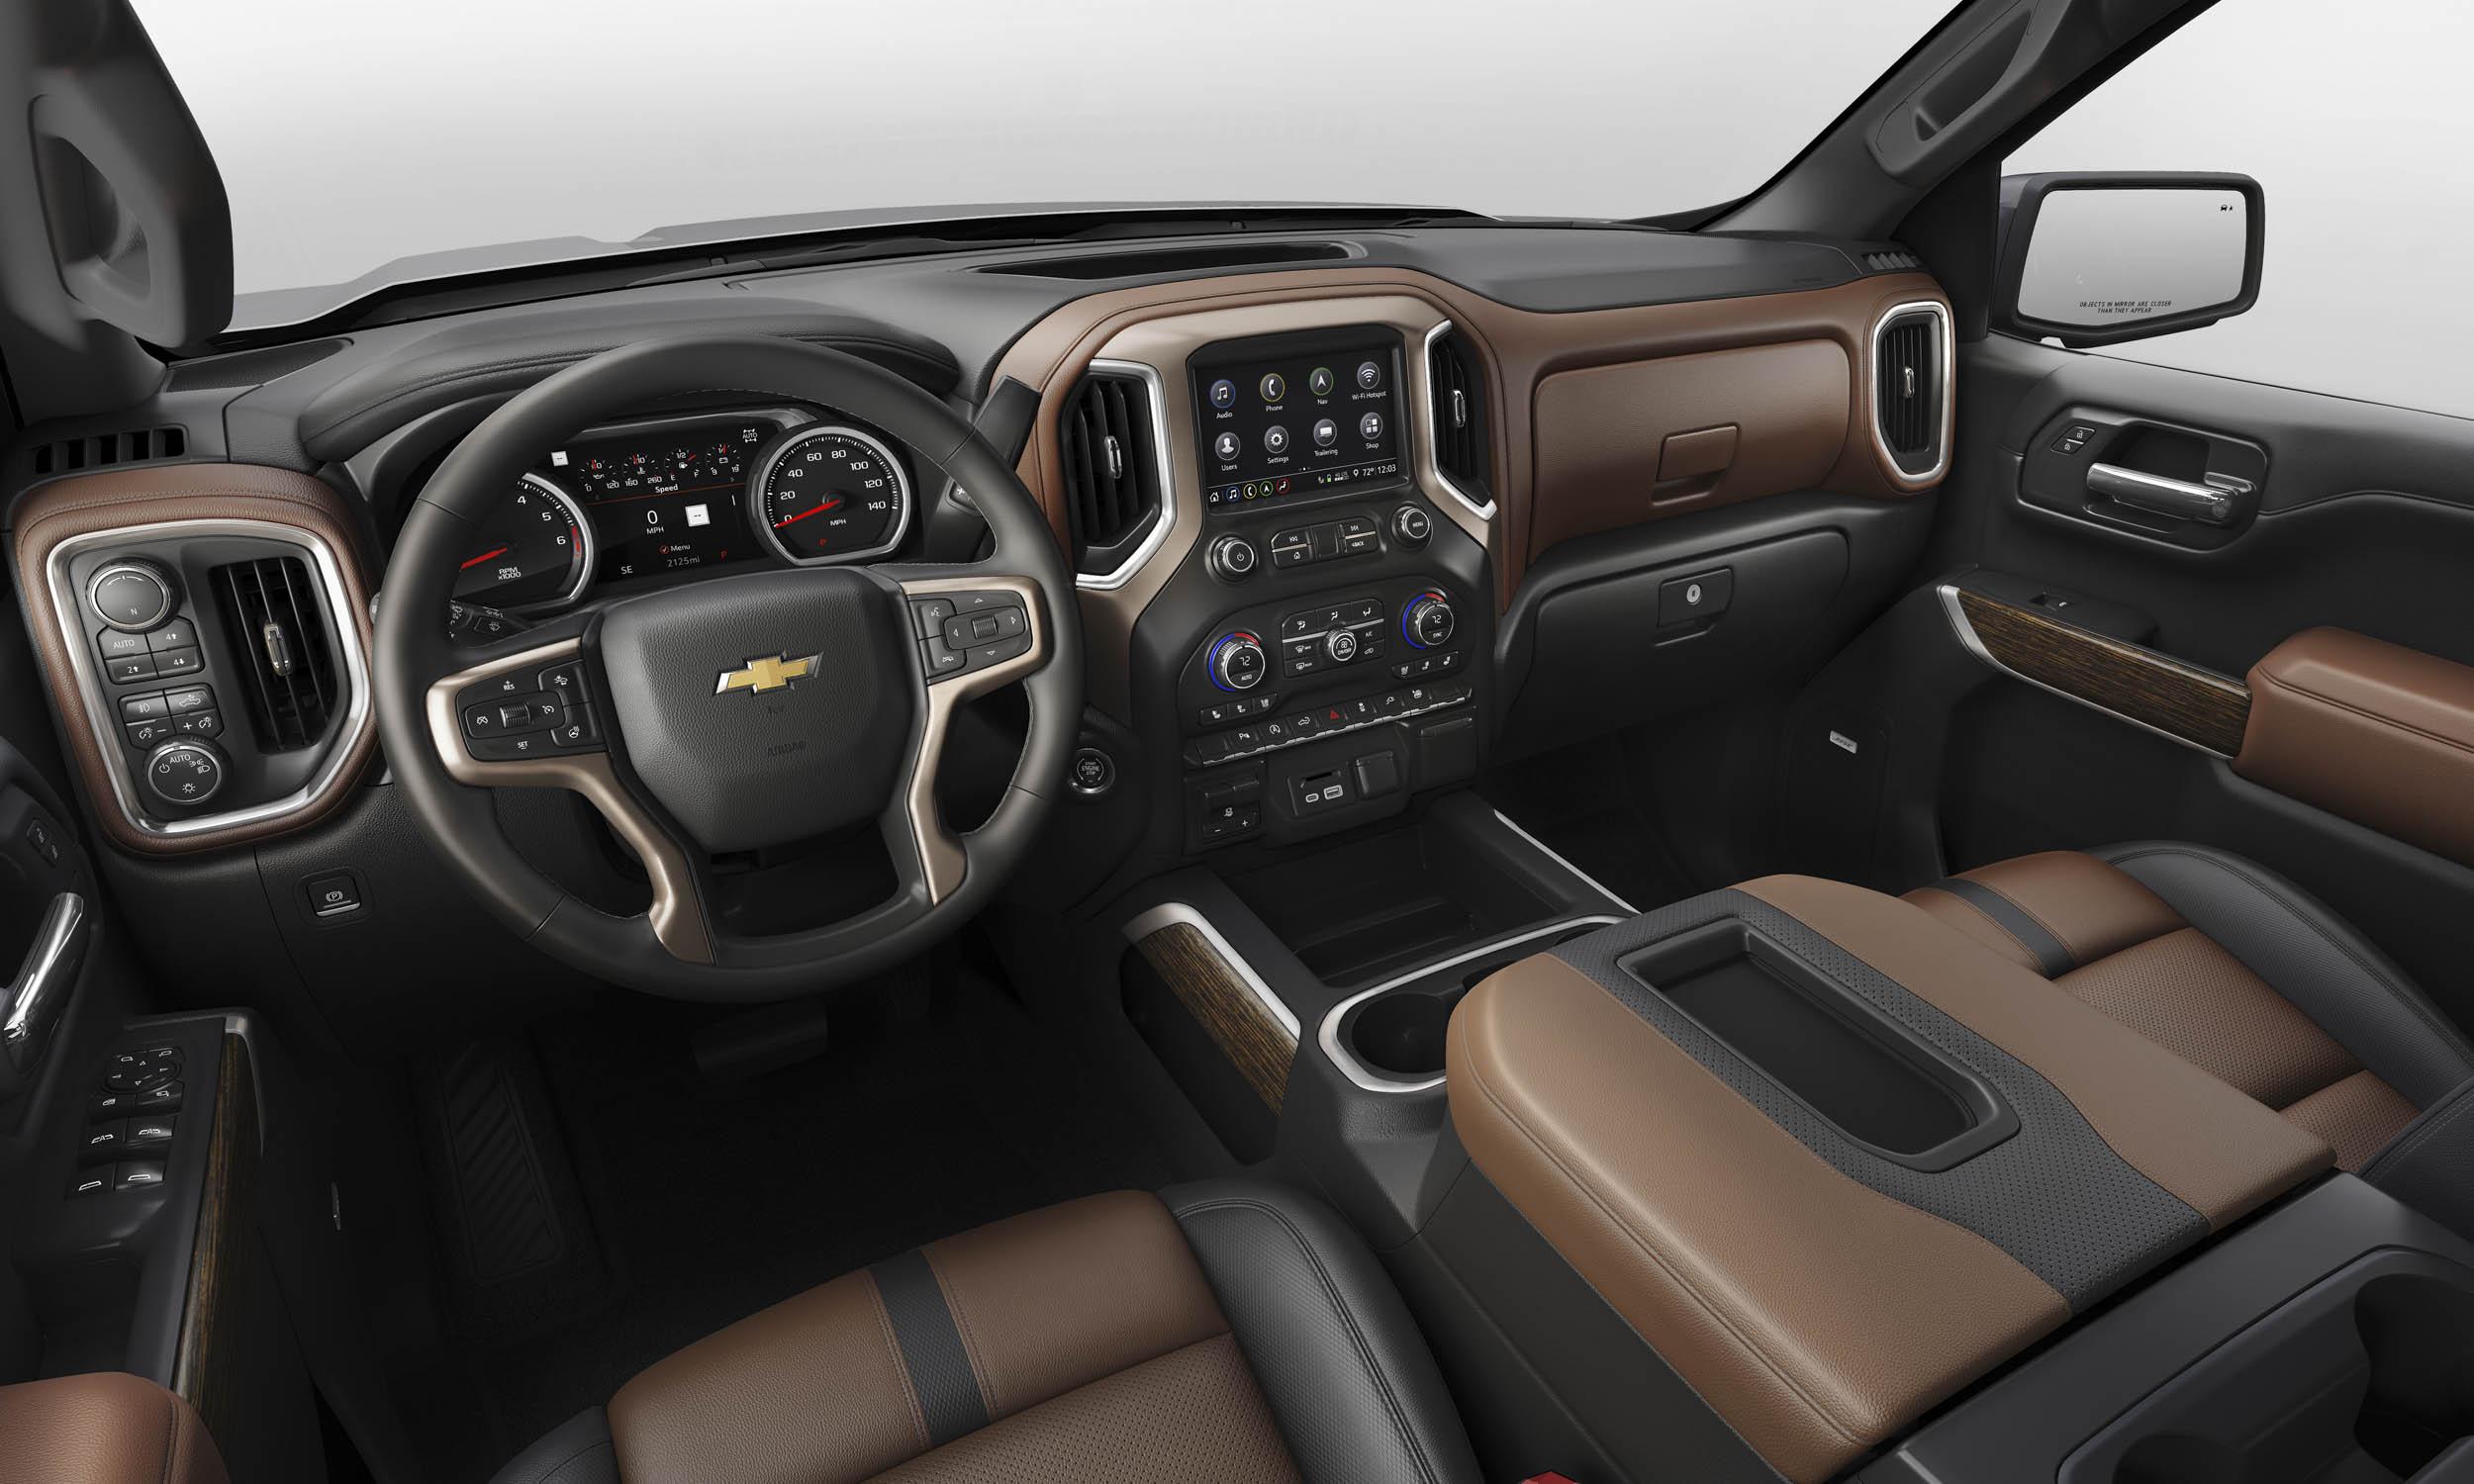 2006 Chevrolet Hhr Interior